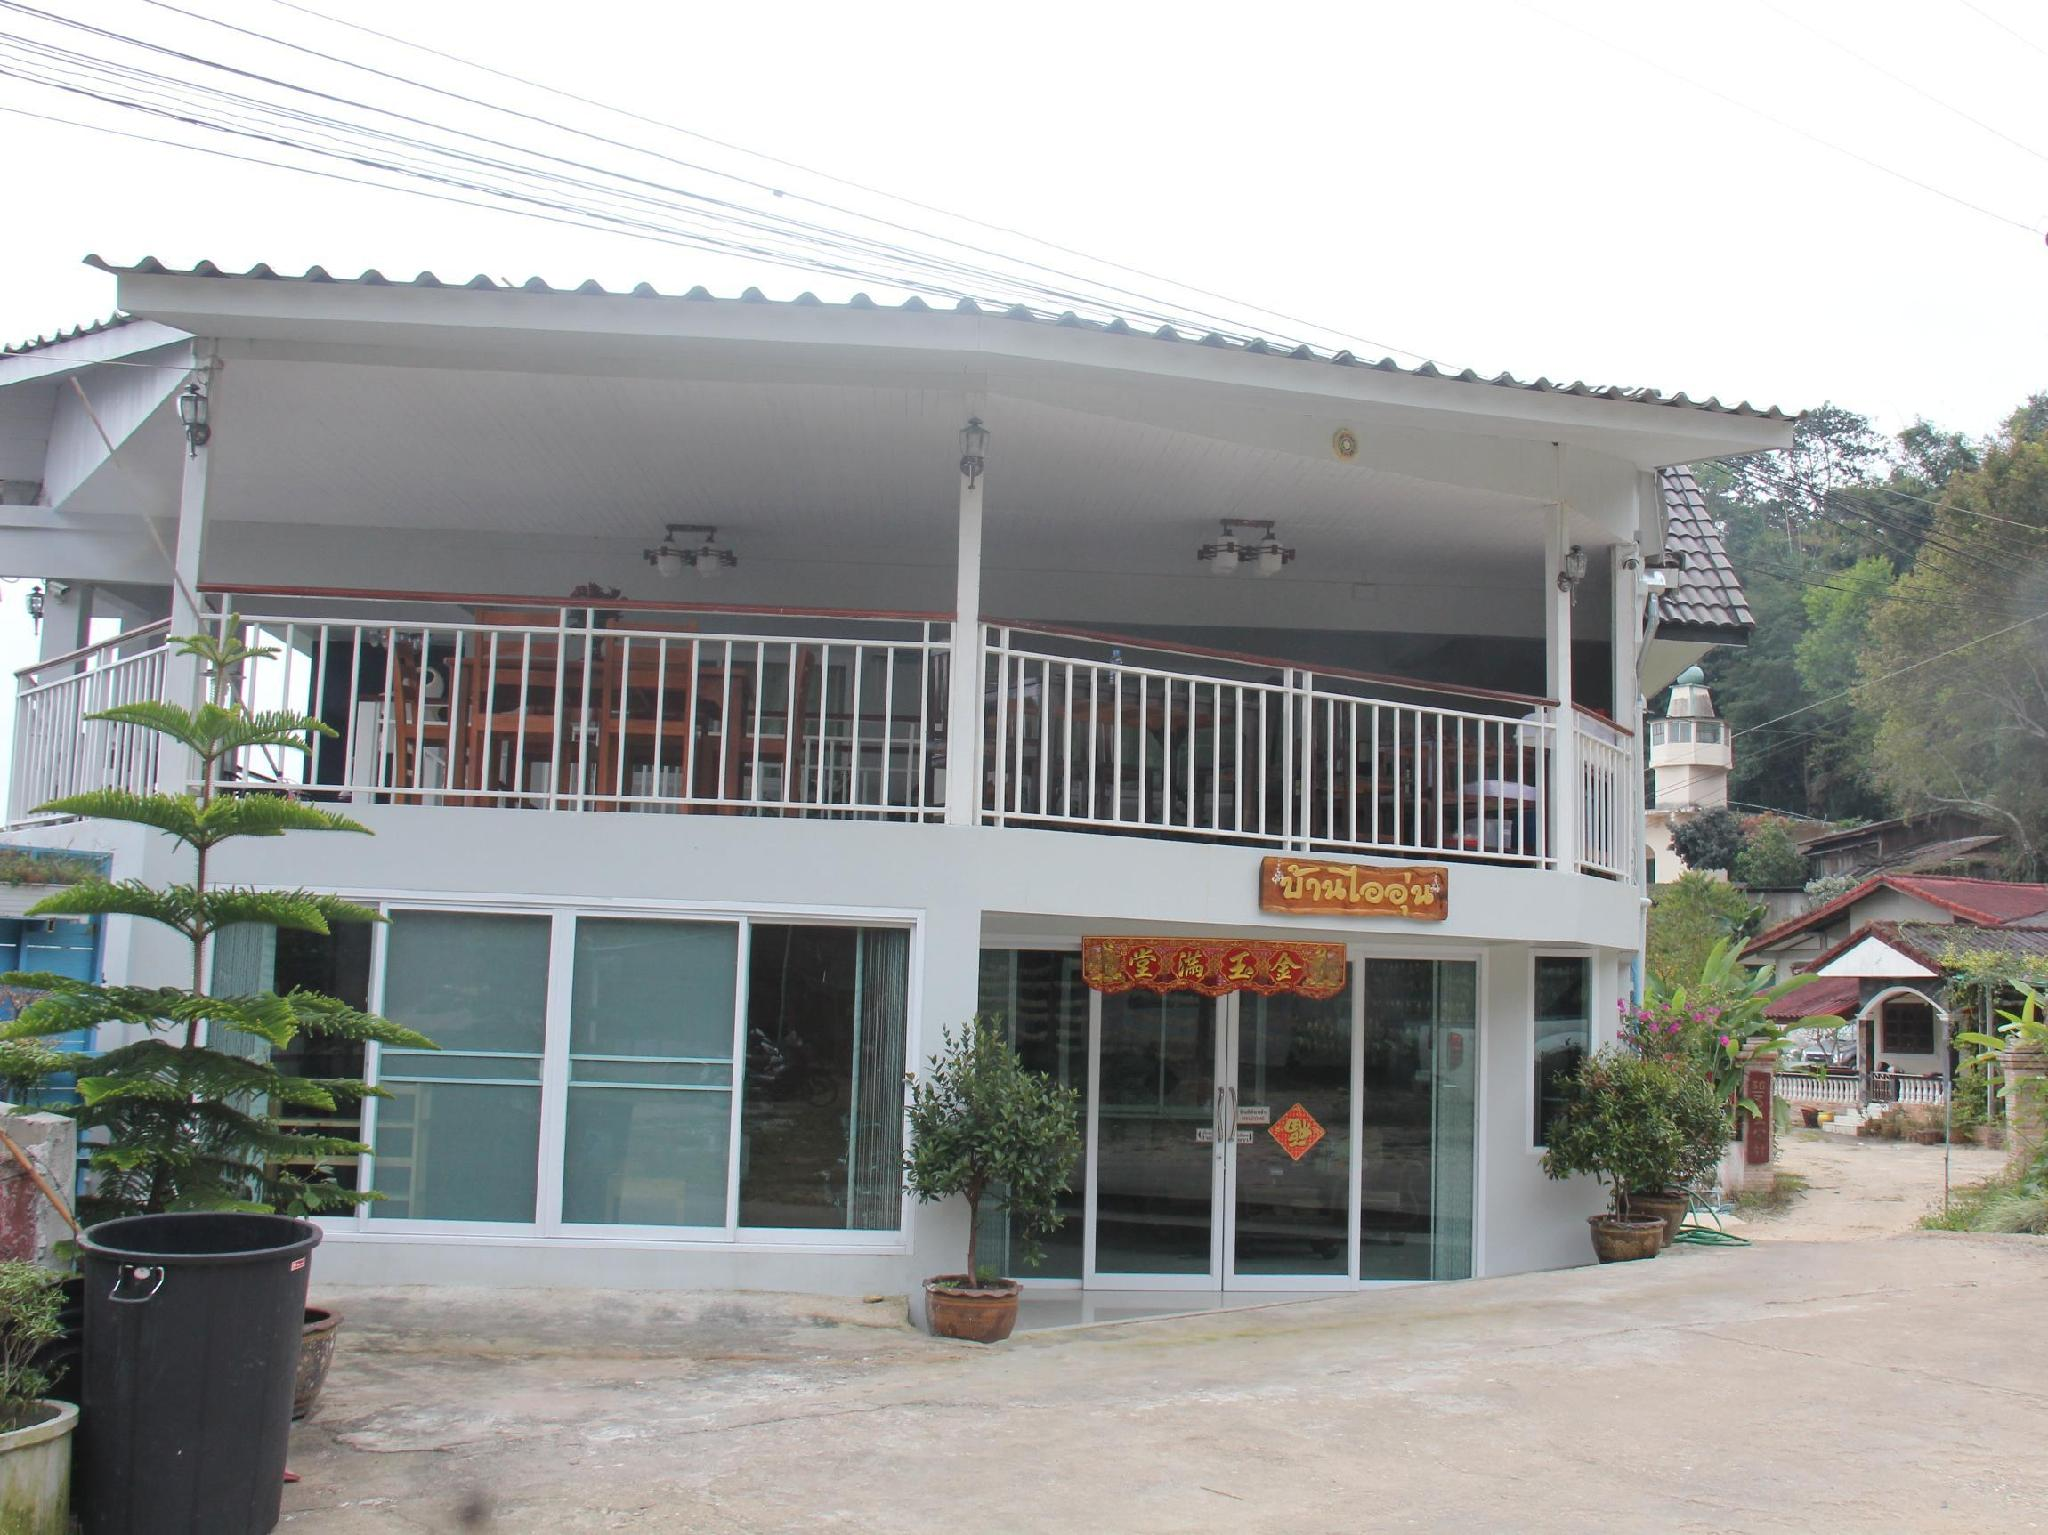 Baan Aioon Maesalong,บ้านไออุ่น แม่สลอง